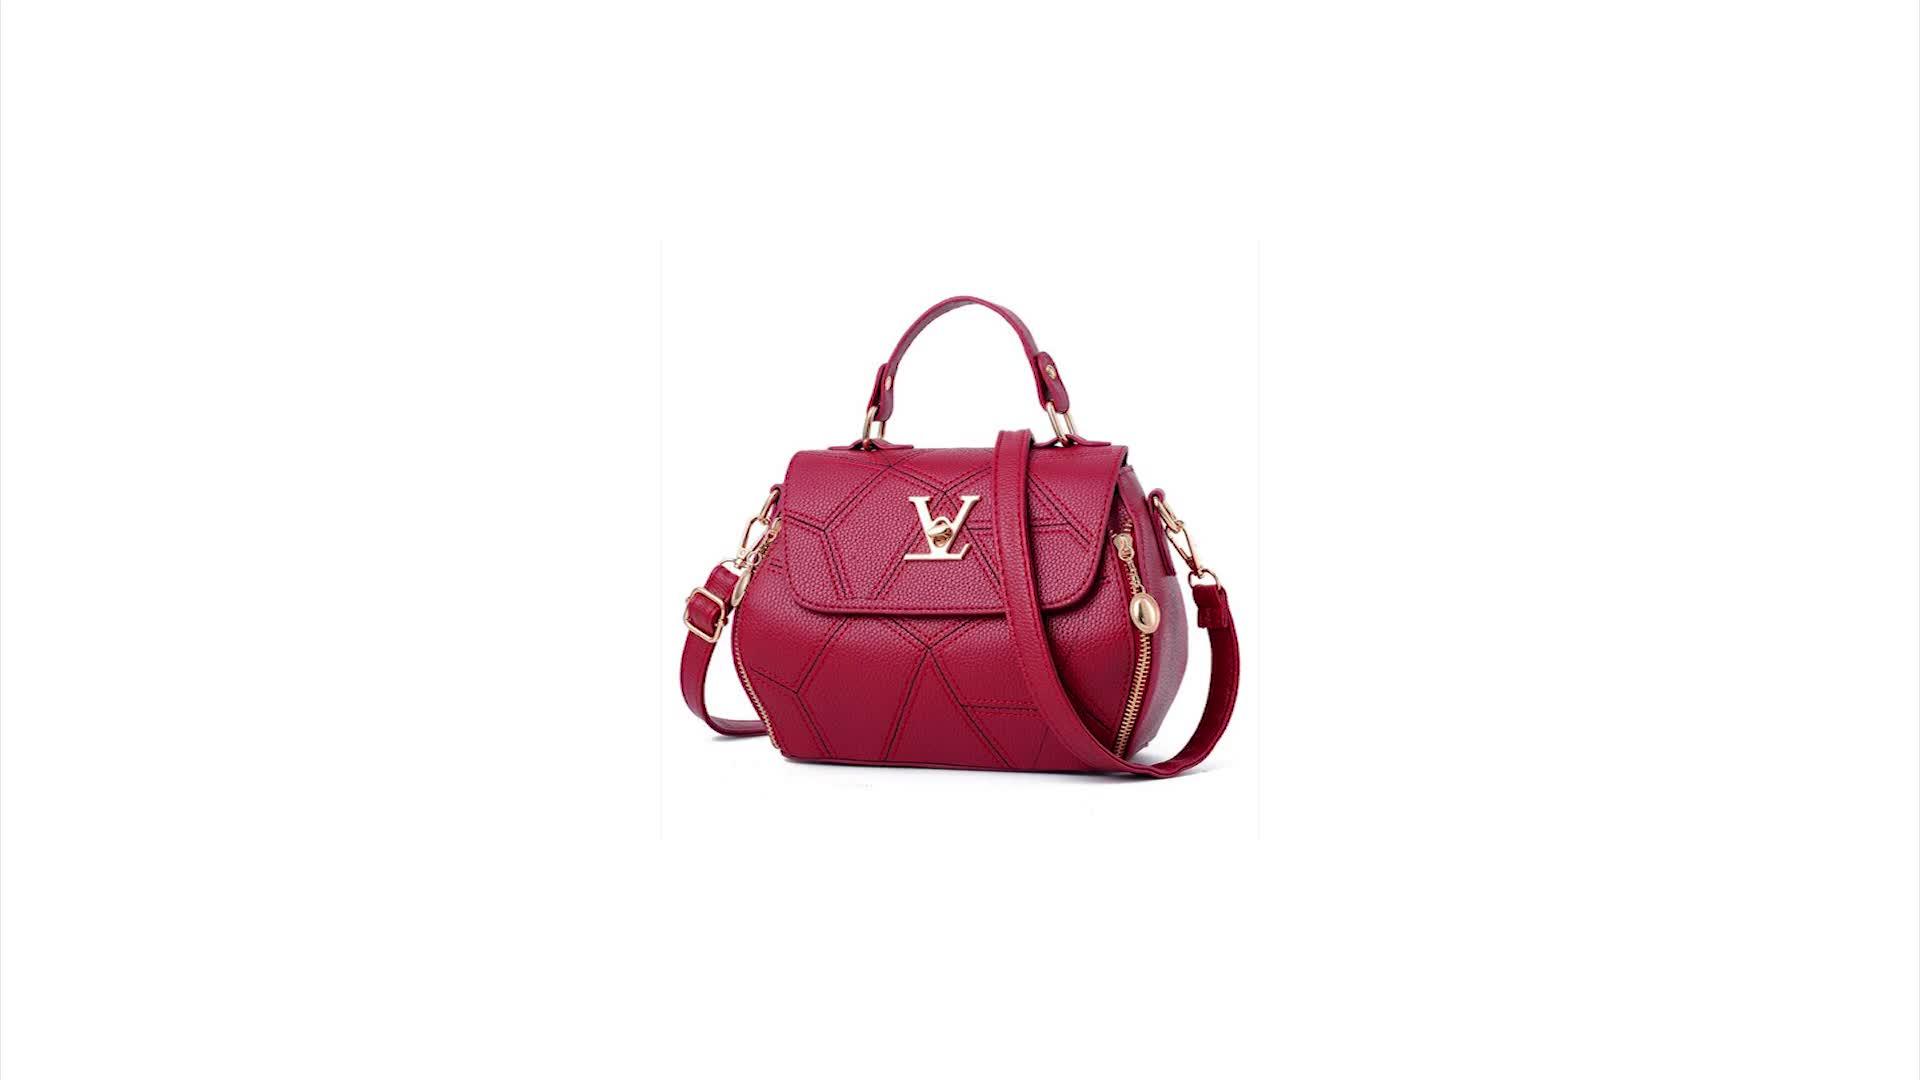 EMC041 Wholesale ladies tote shoulder bags women designer brand name pu leather handbags